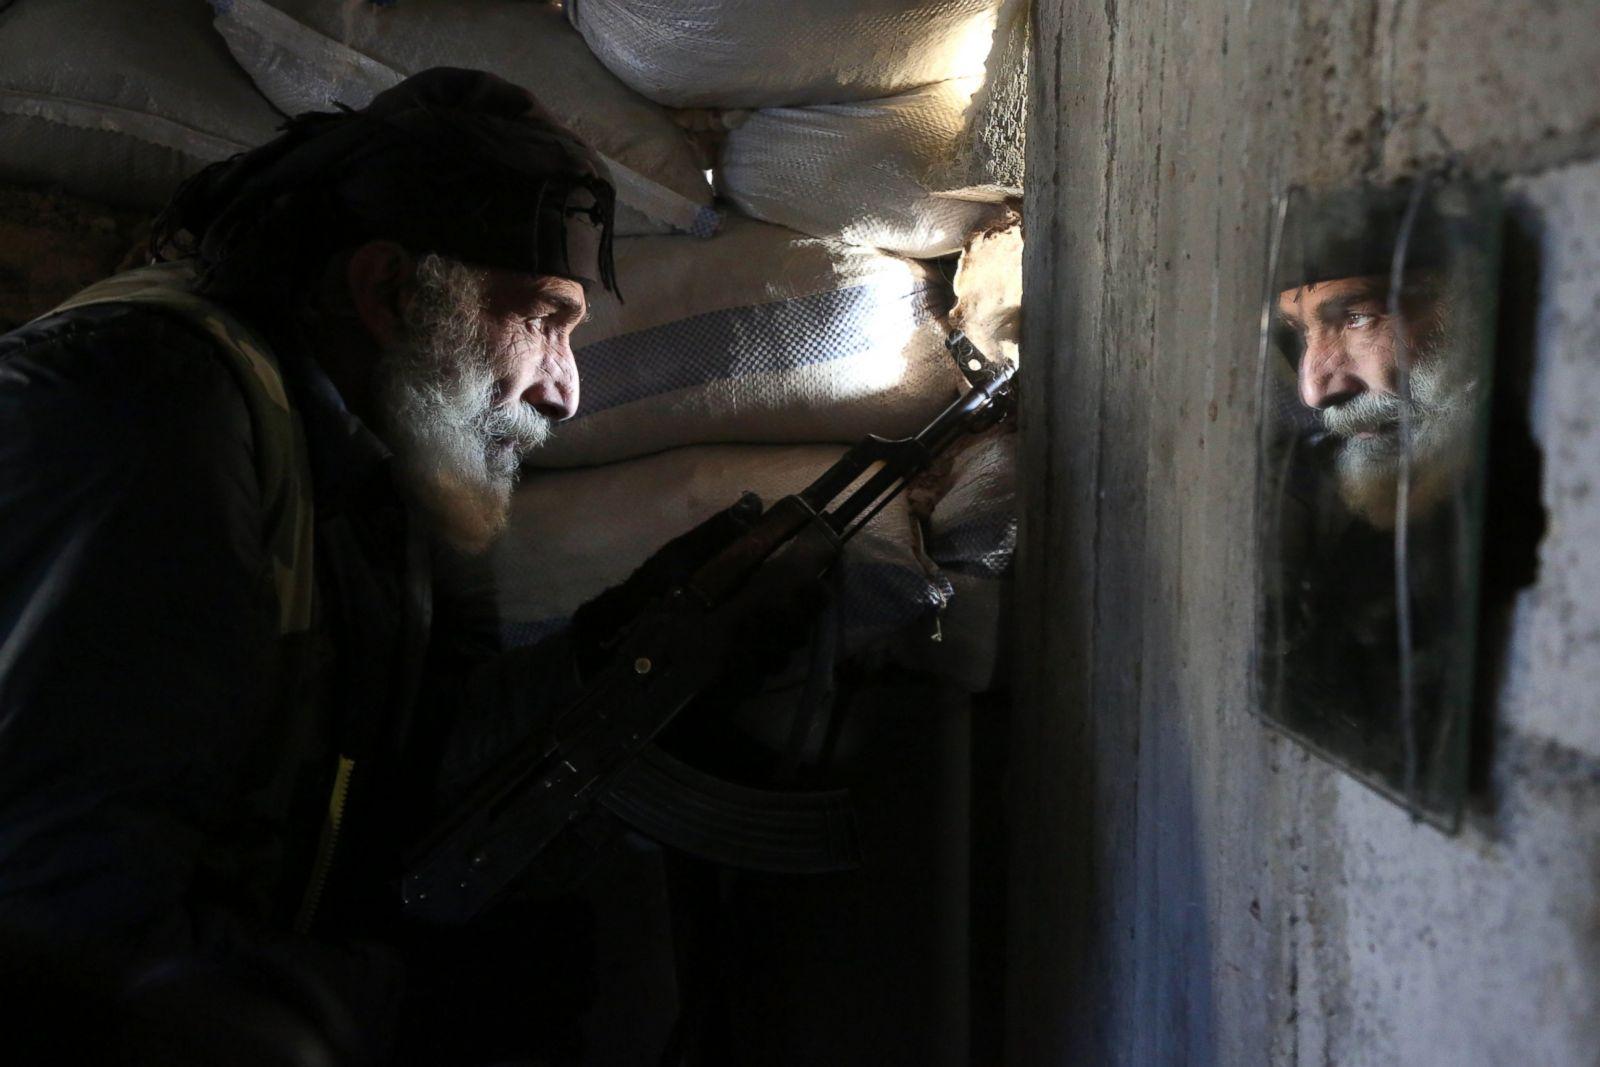 gty-pow-syrian-fighter-mirror-hb-170209_3x2_1600.jpg